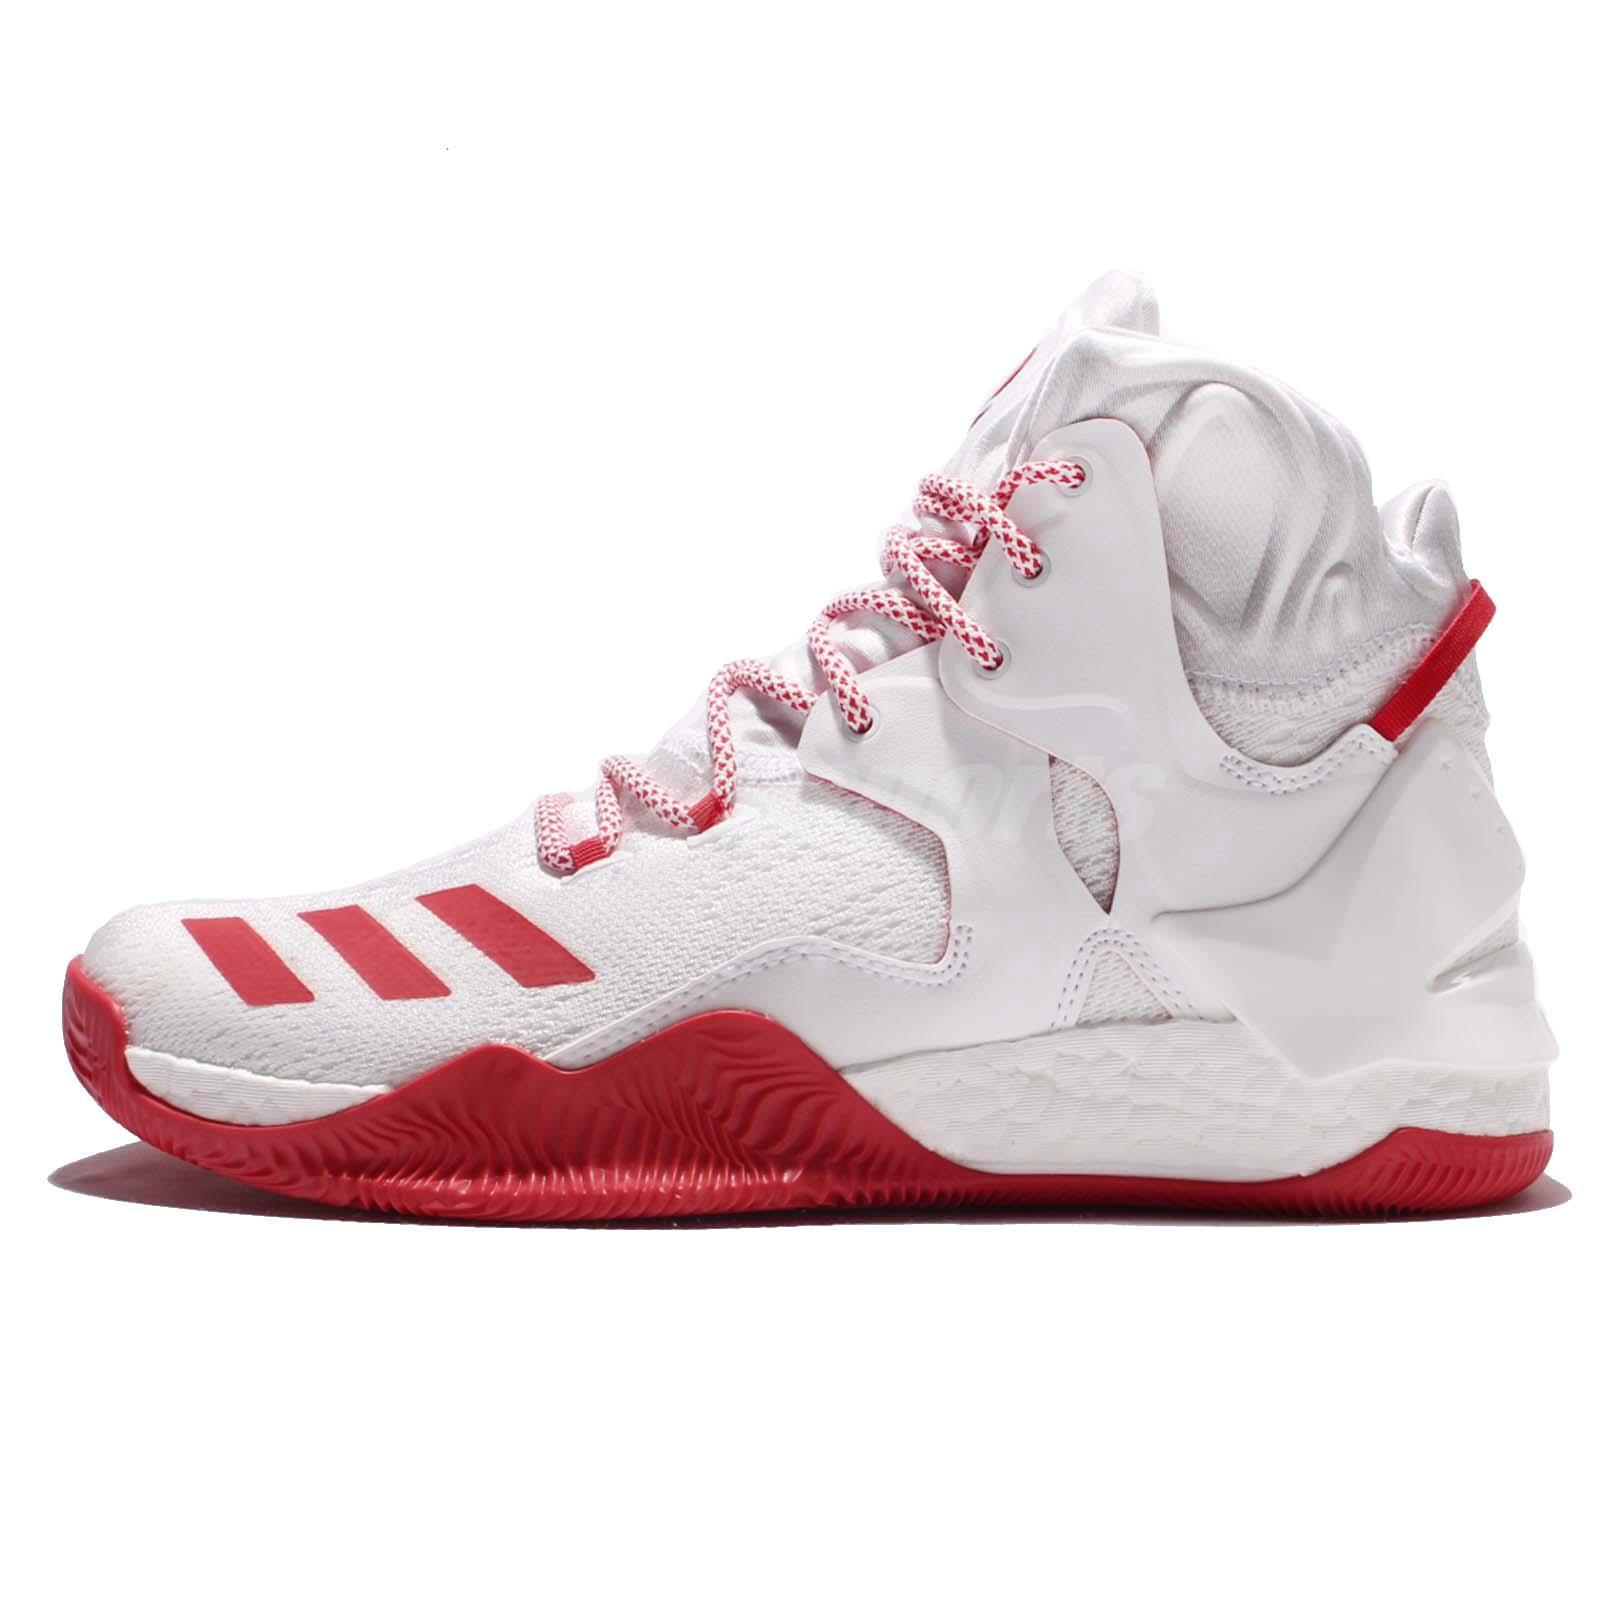 adidas D Rose 7 VII Derrick White Ray Red Mens Basketball ...